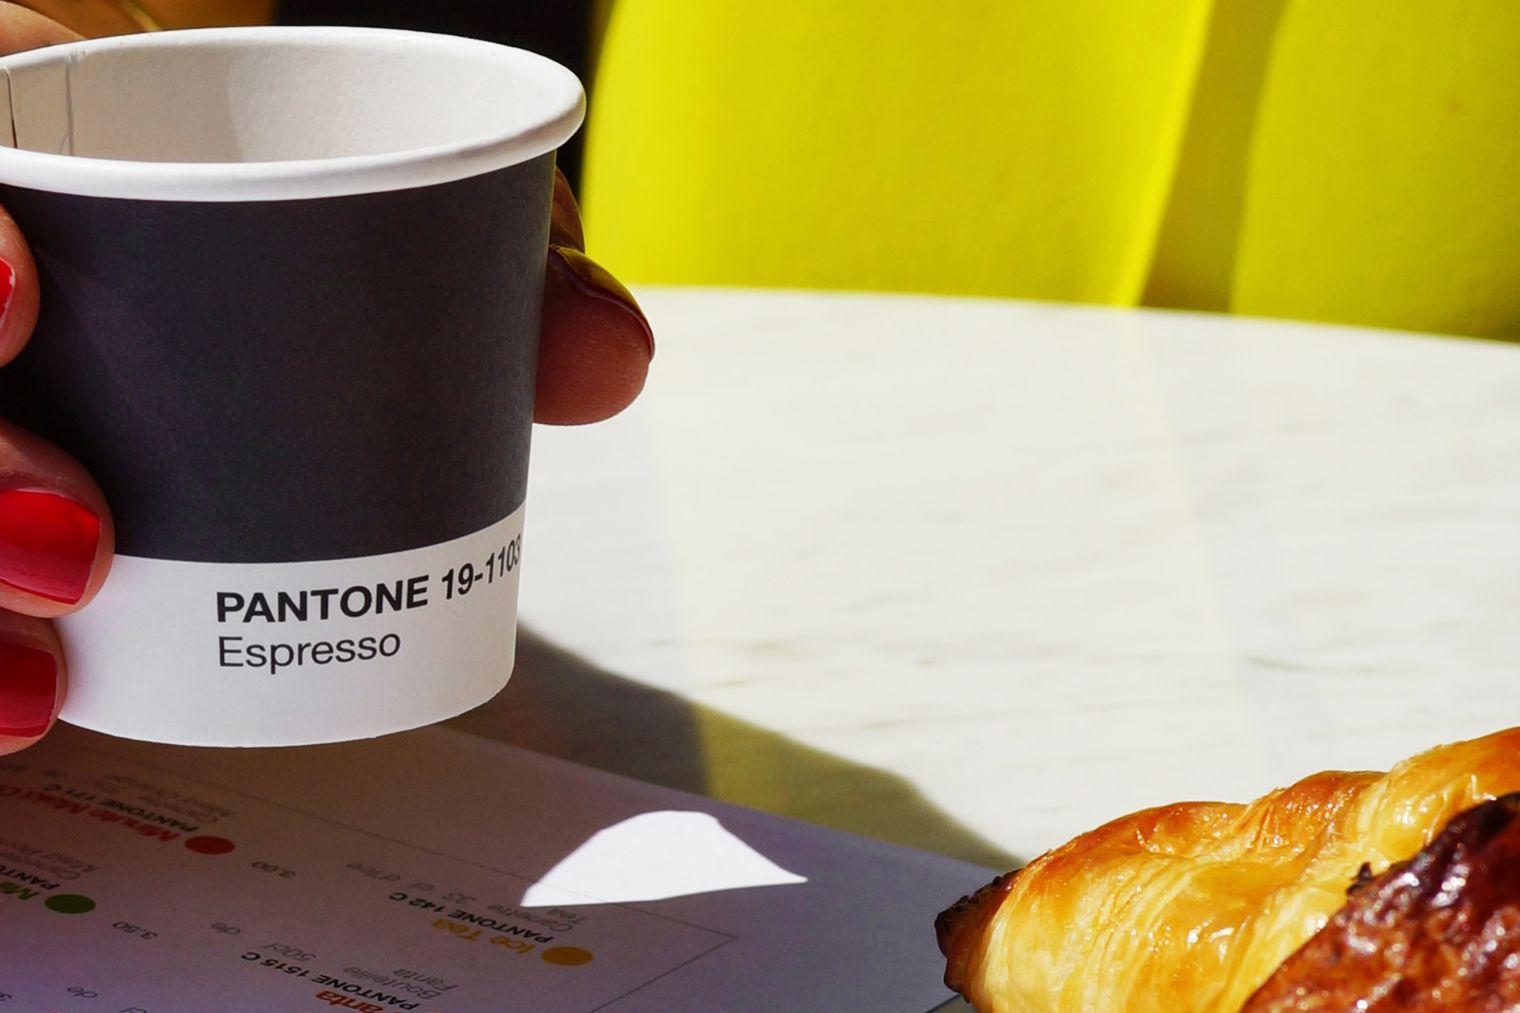 PANTONE CAFE 45a